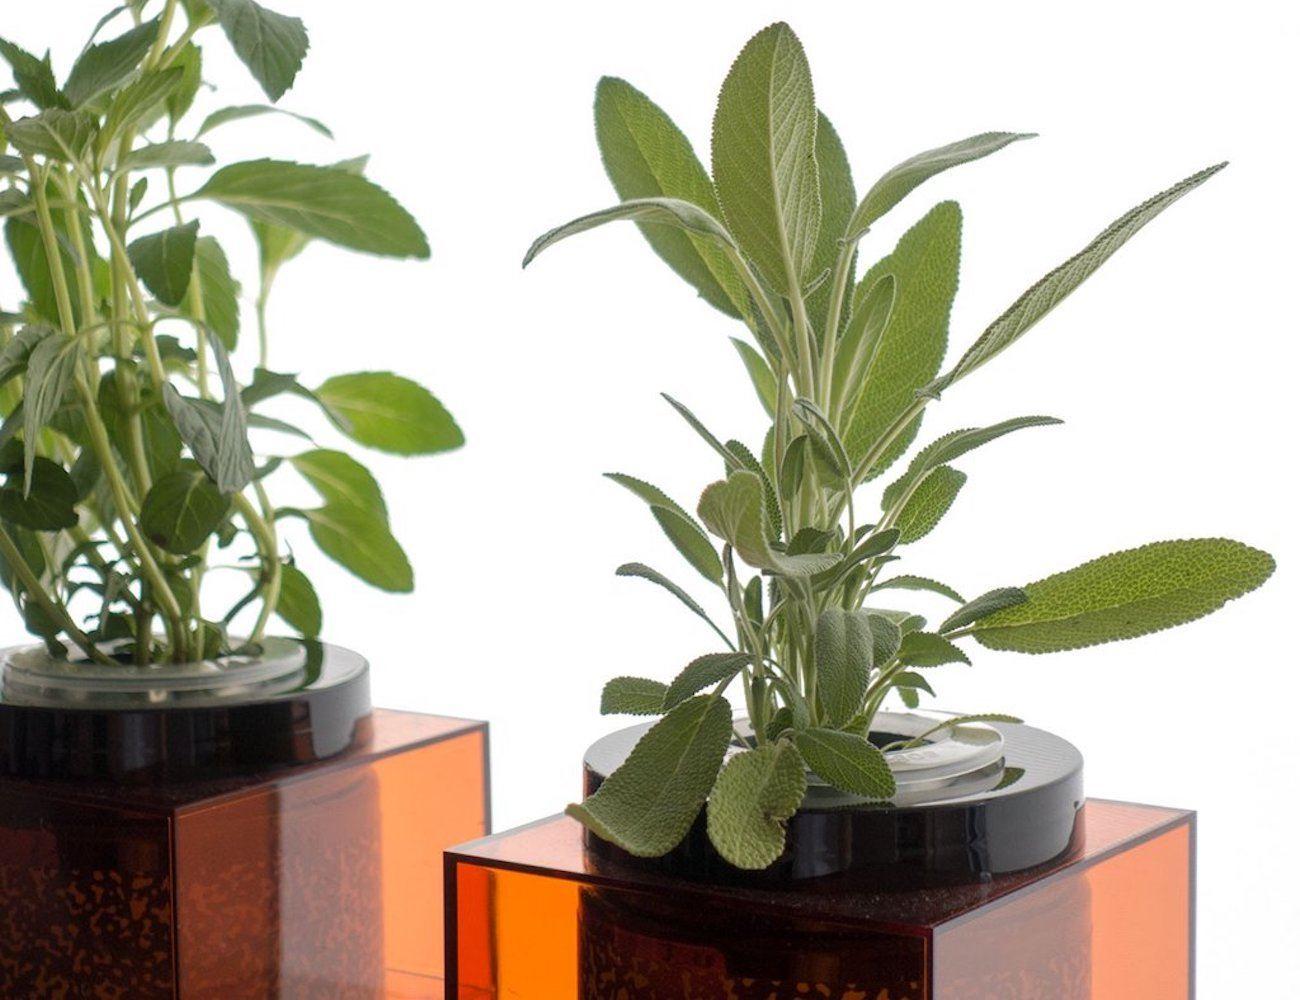 Futurefarms Spacepot Hydroponic Planter